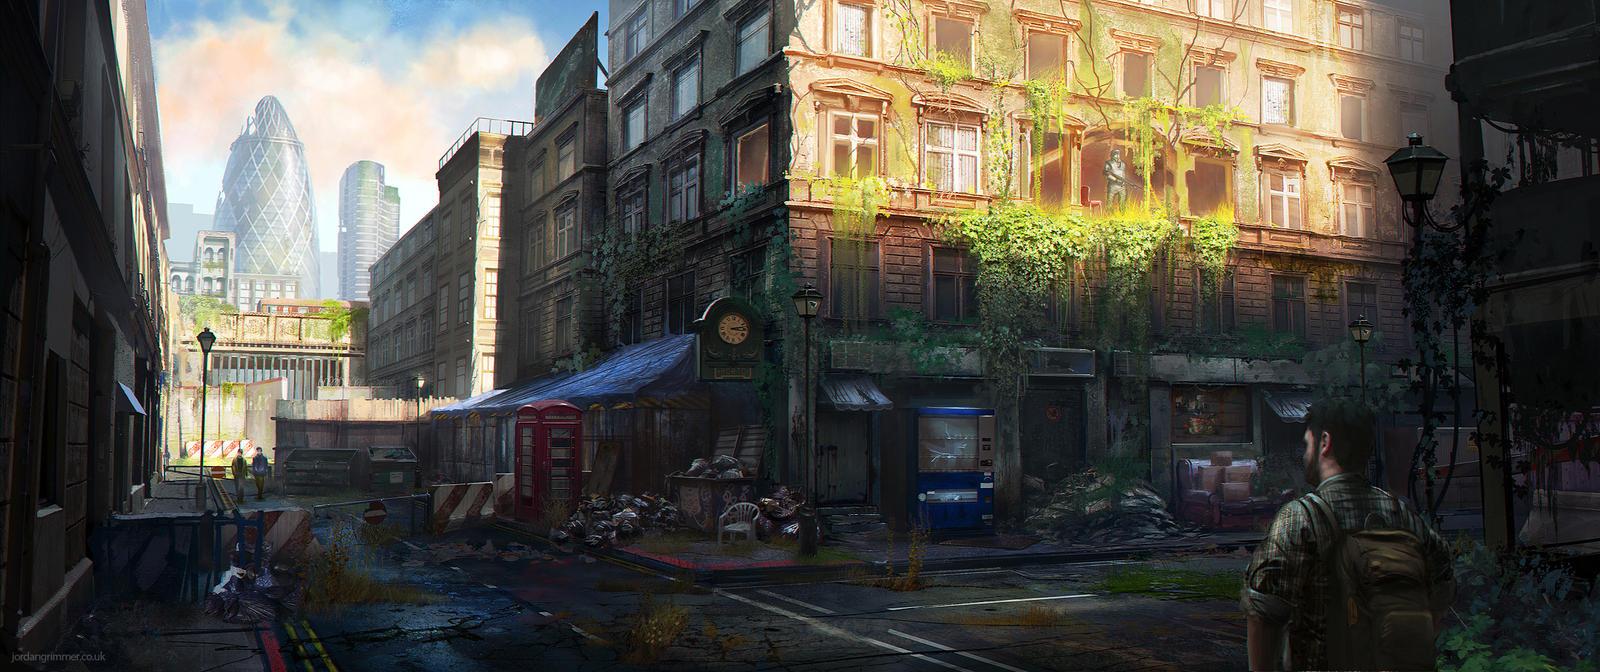 London Quarantine Zone by jordangrimmer